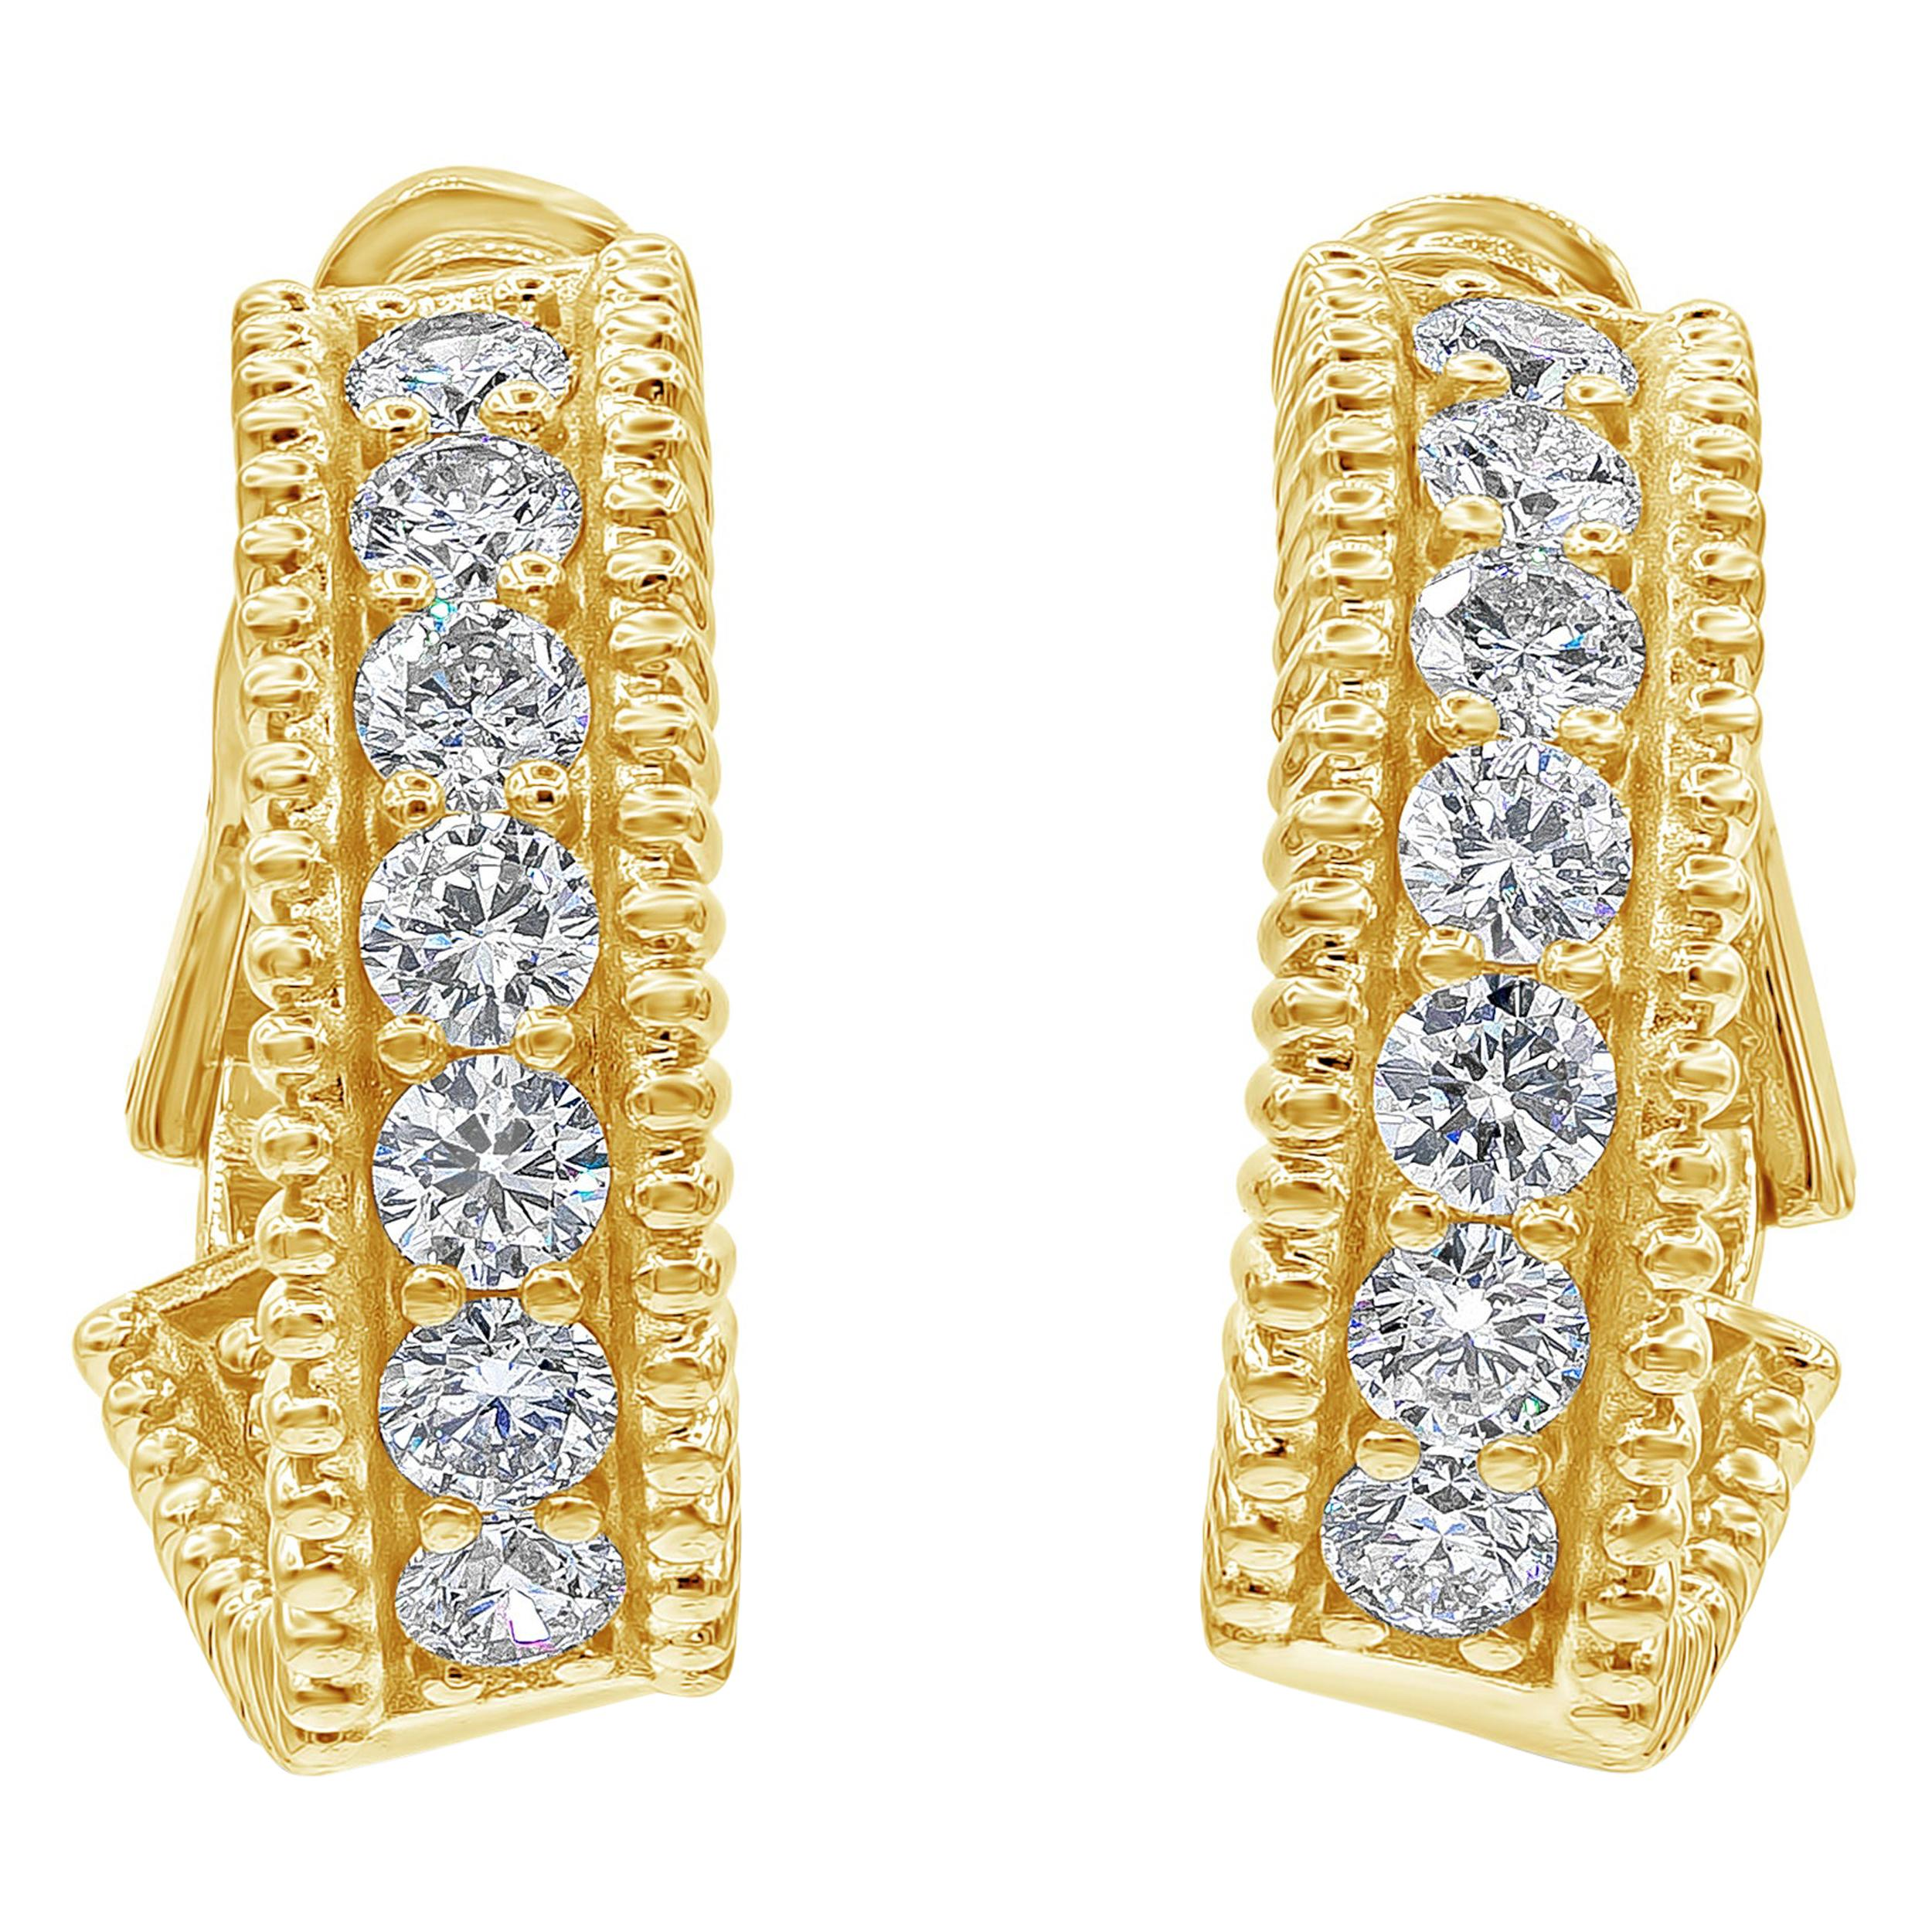 Roman Malakov, 3.13 Carat Round Diamond Curved Hoop Earrings